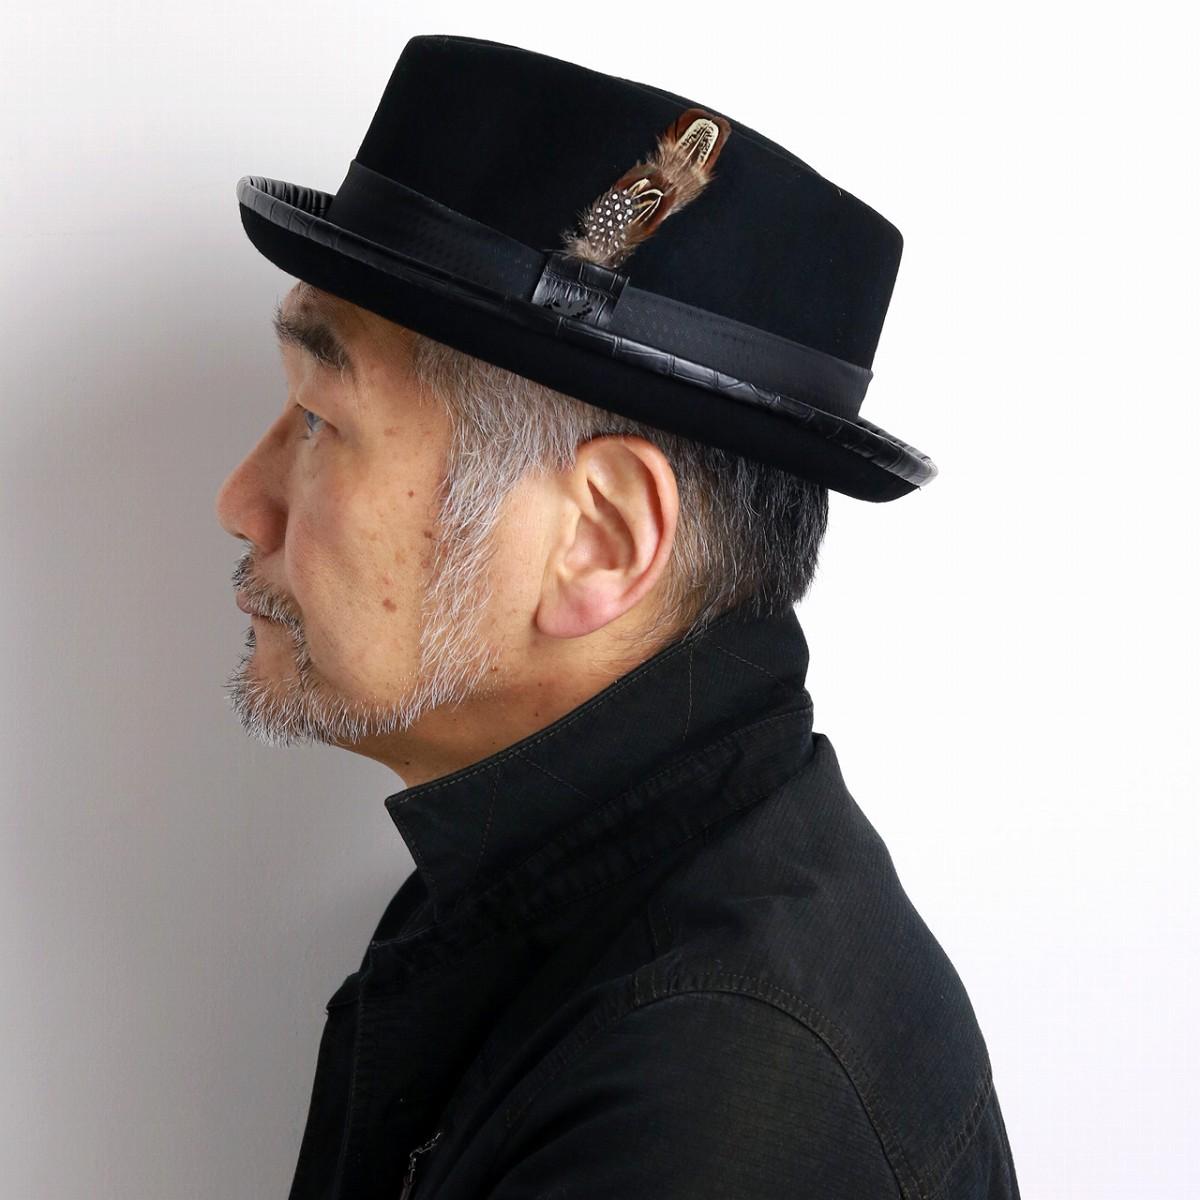 ... Gentleman big size M L LL United States brand fashion classical hat  black black  fedora  ... 1687a6c2ac1